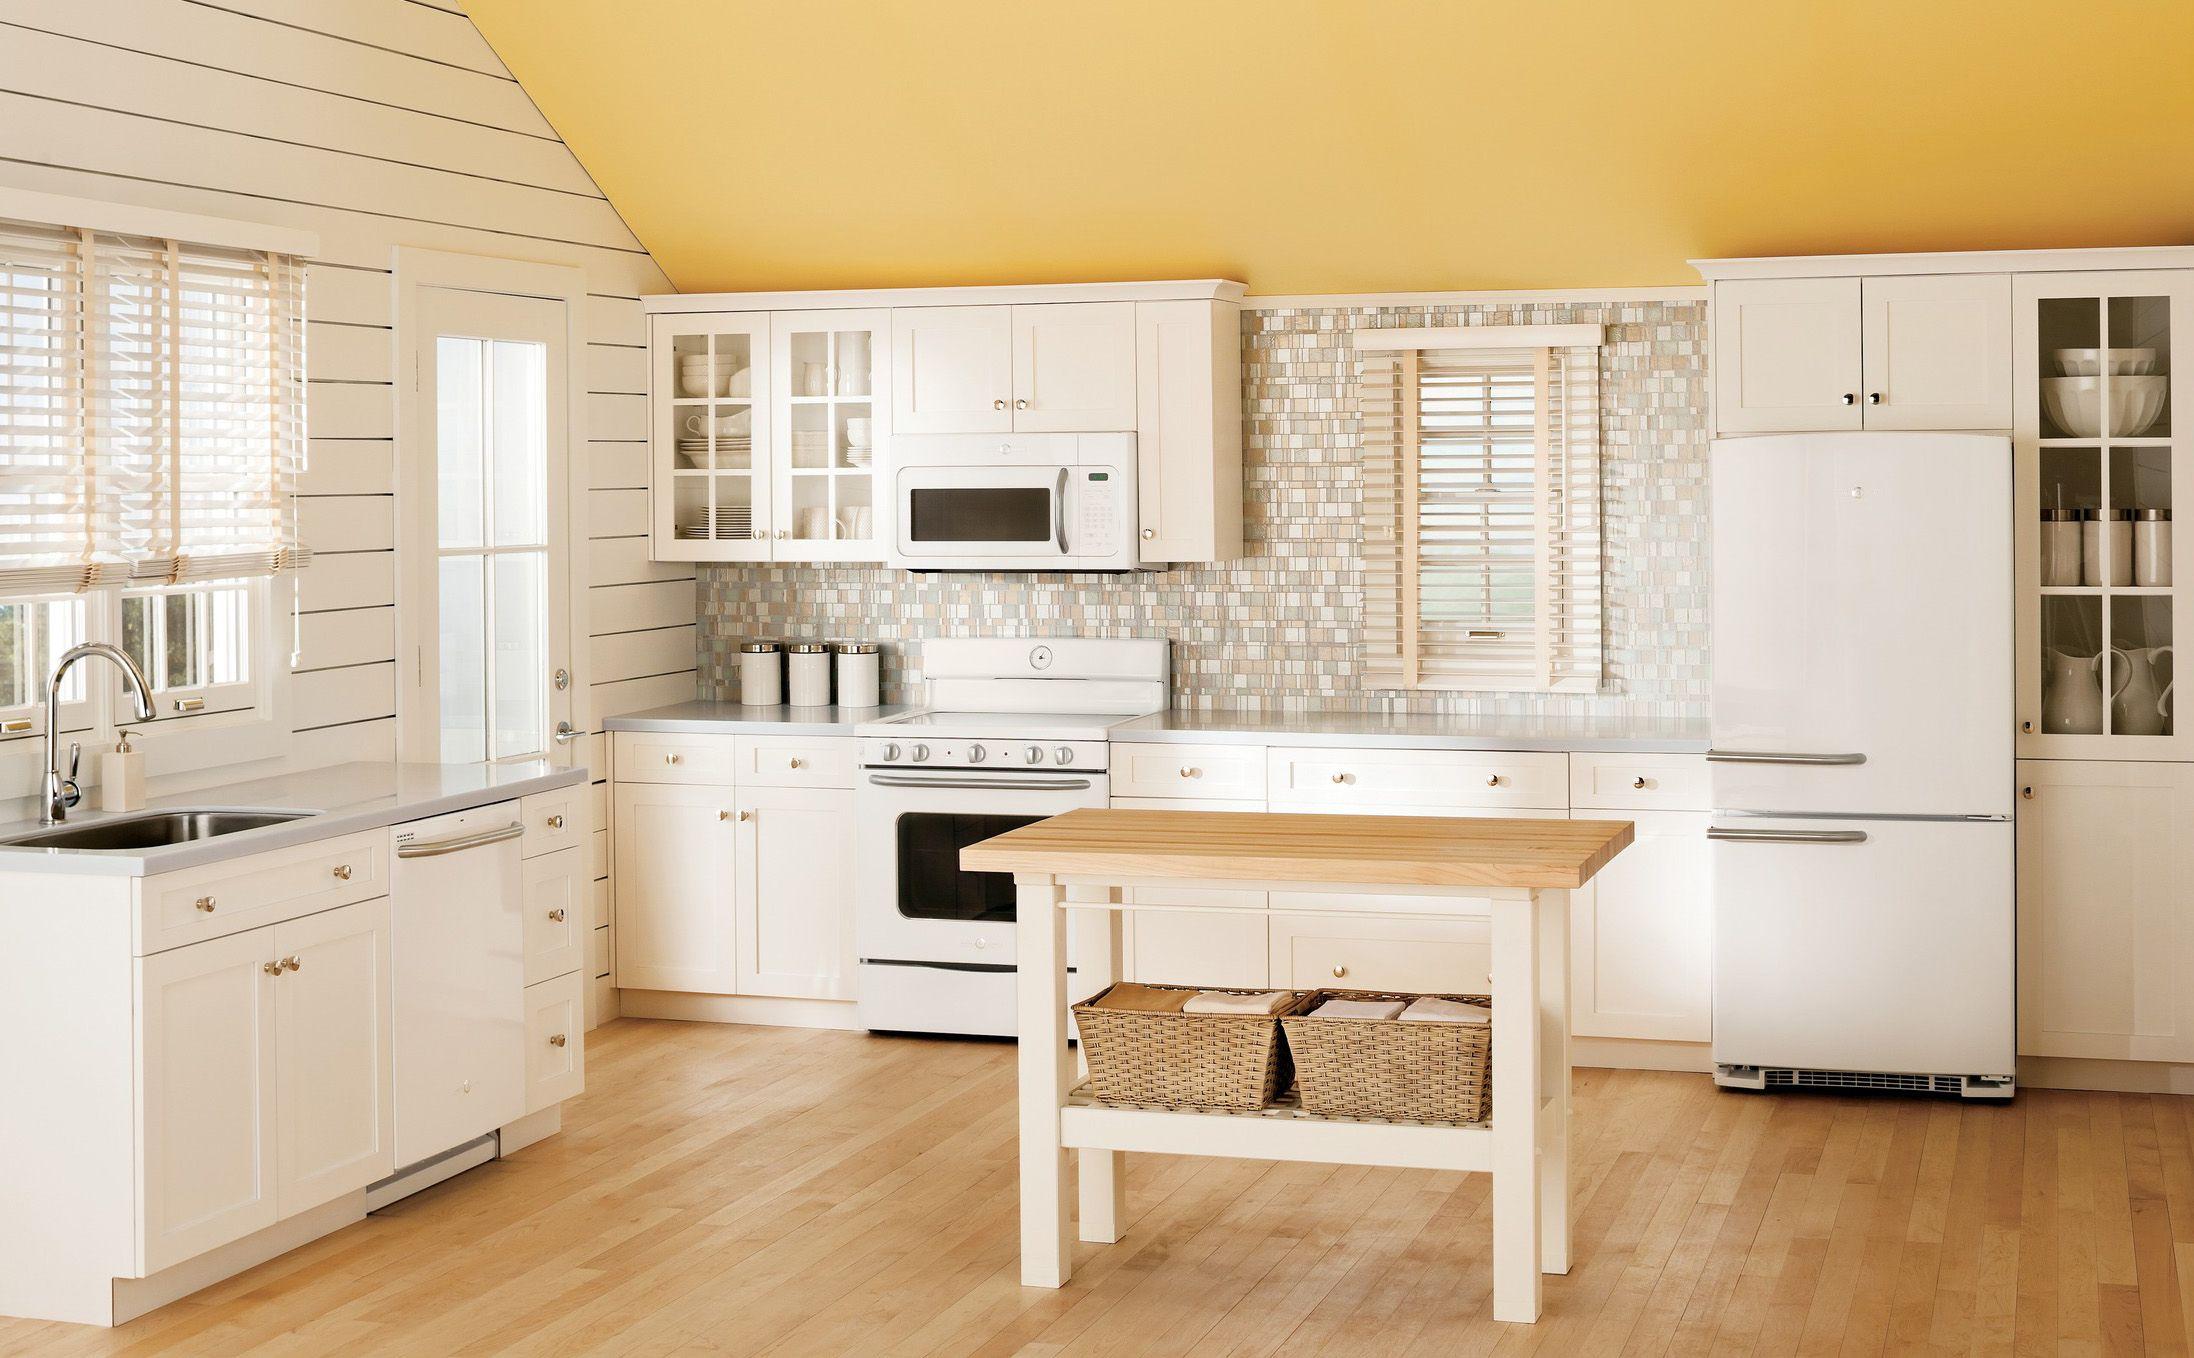 Küche Antik Stil | Kuche Stil Latest Gallery Of Kuche Elegant ...